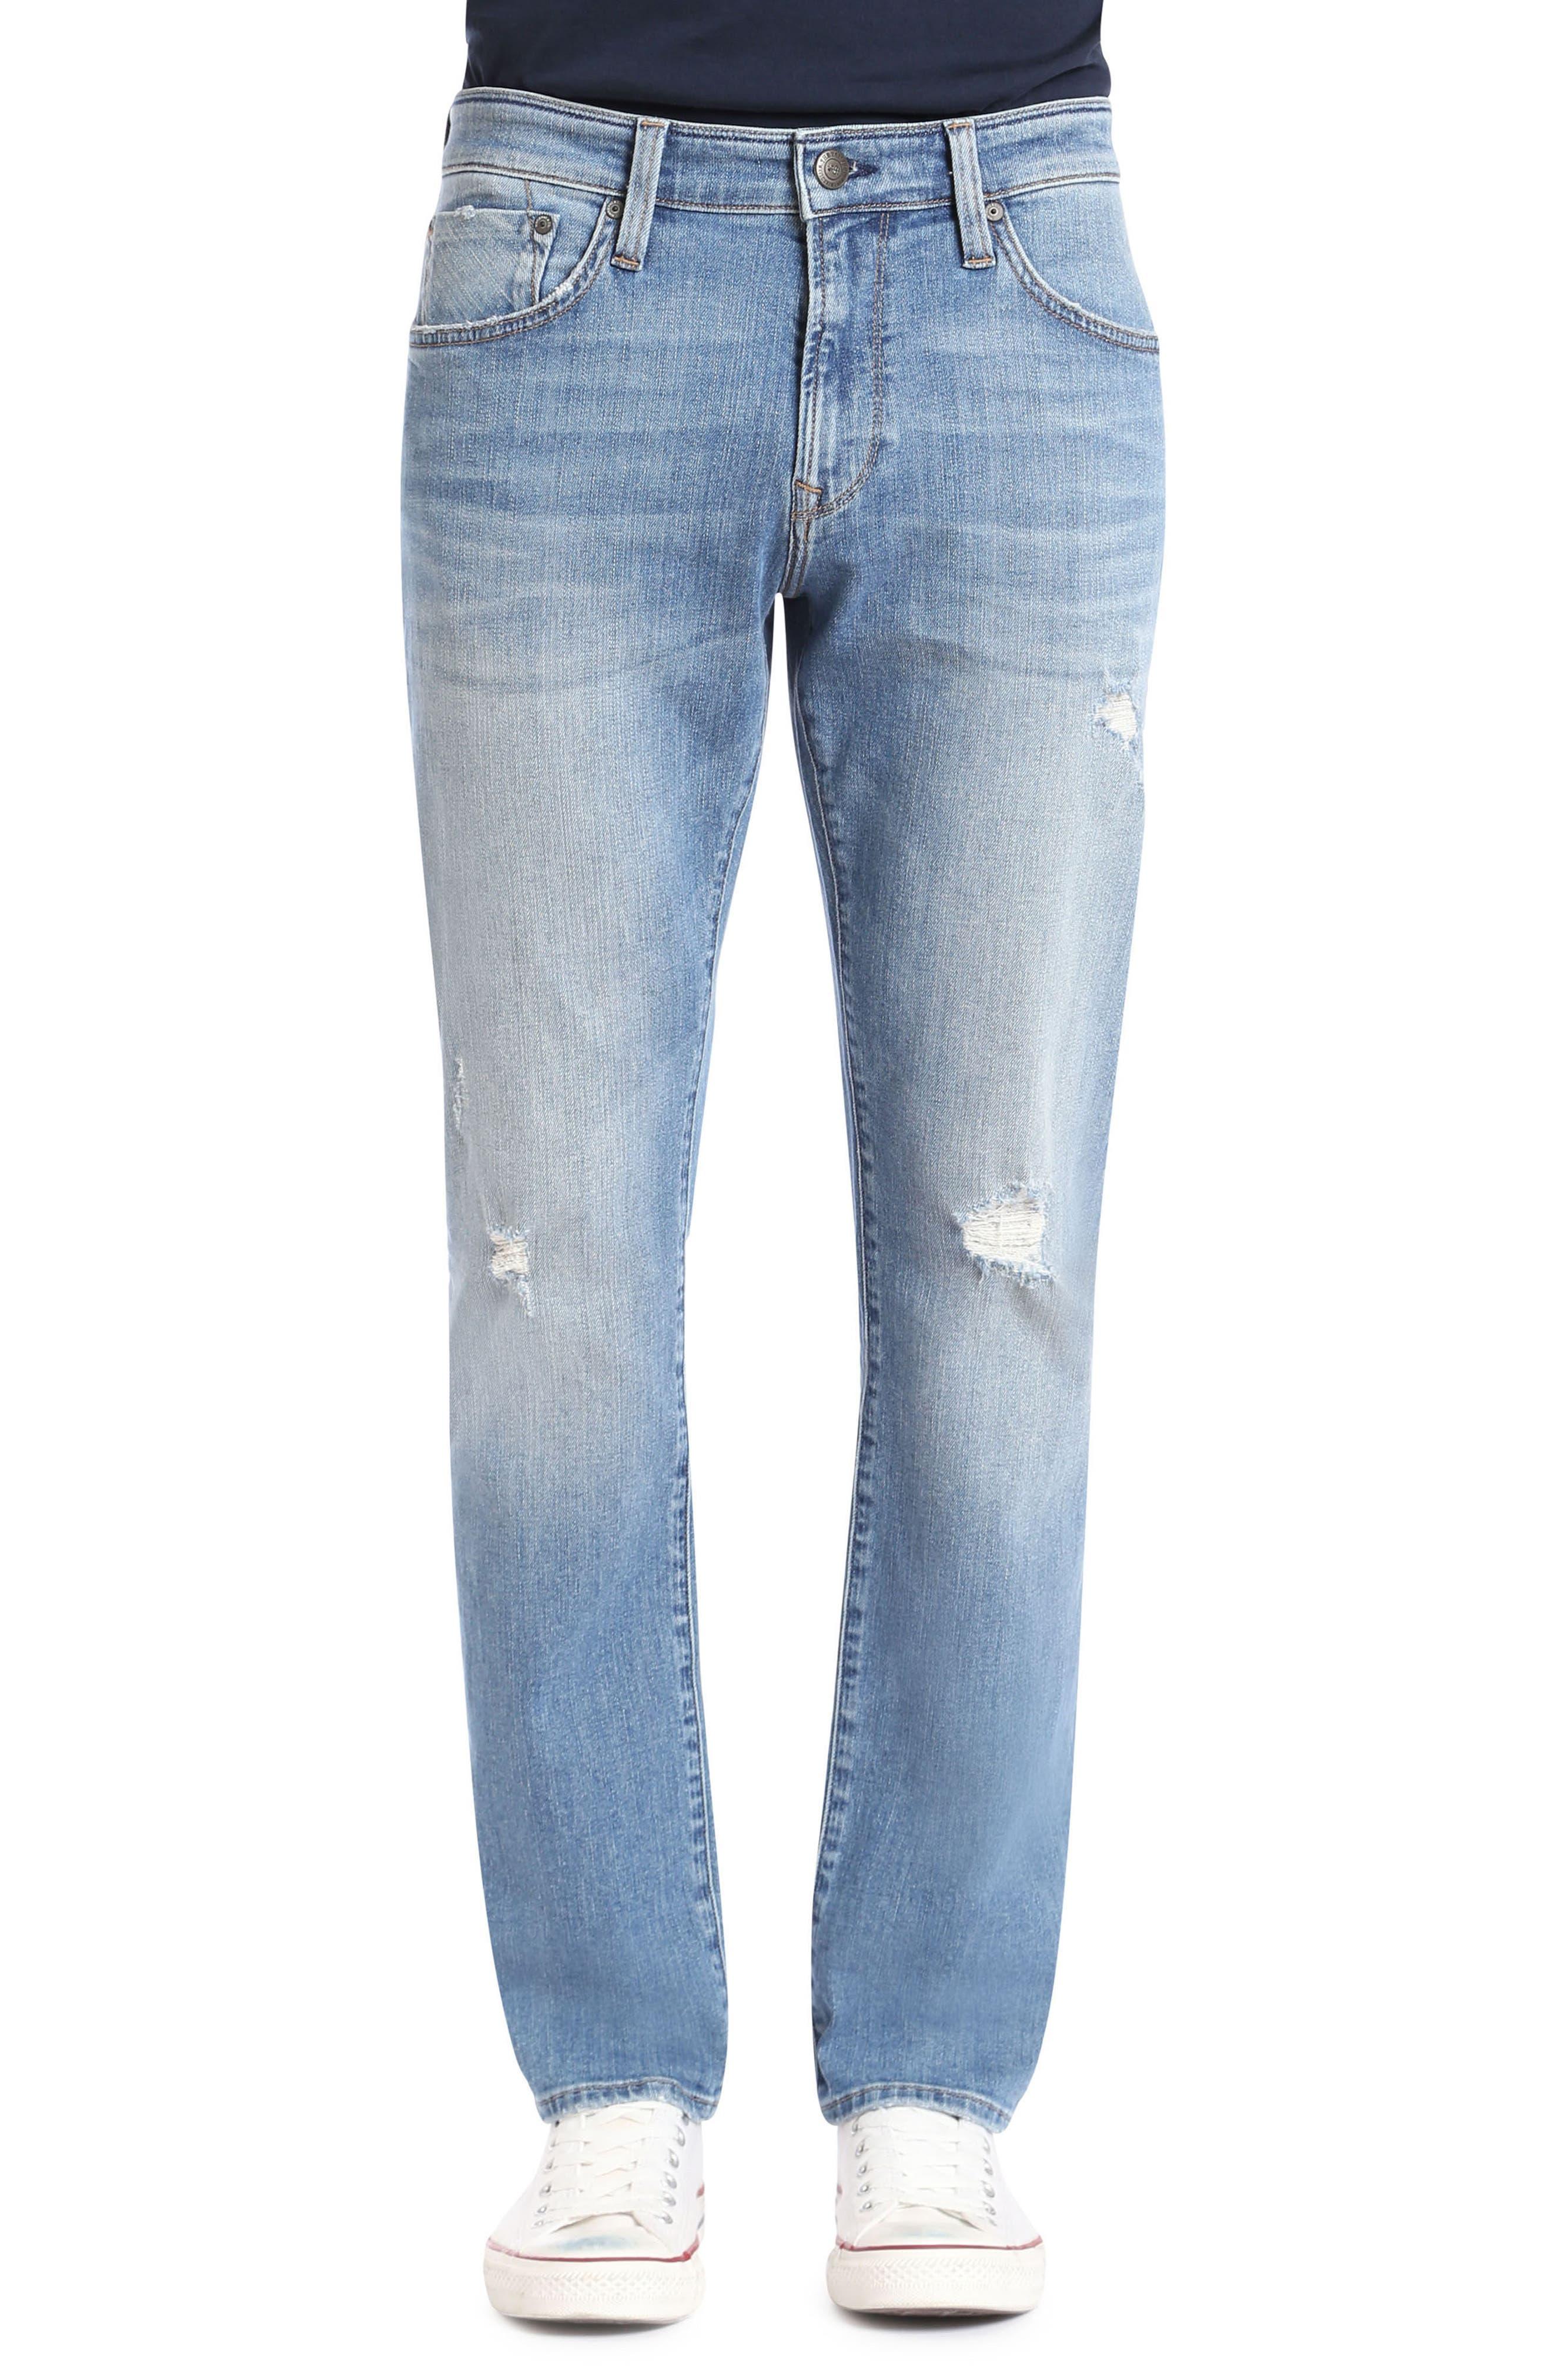 Jake Slim Fit Jeans,                         Main,                         color, 420